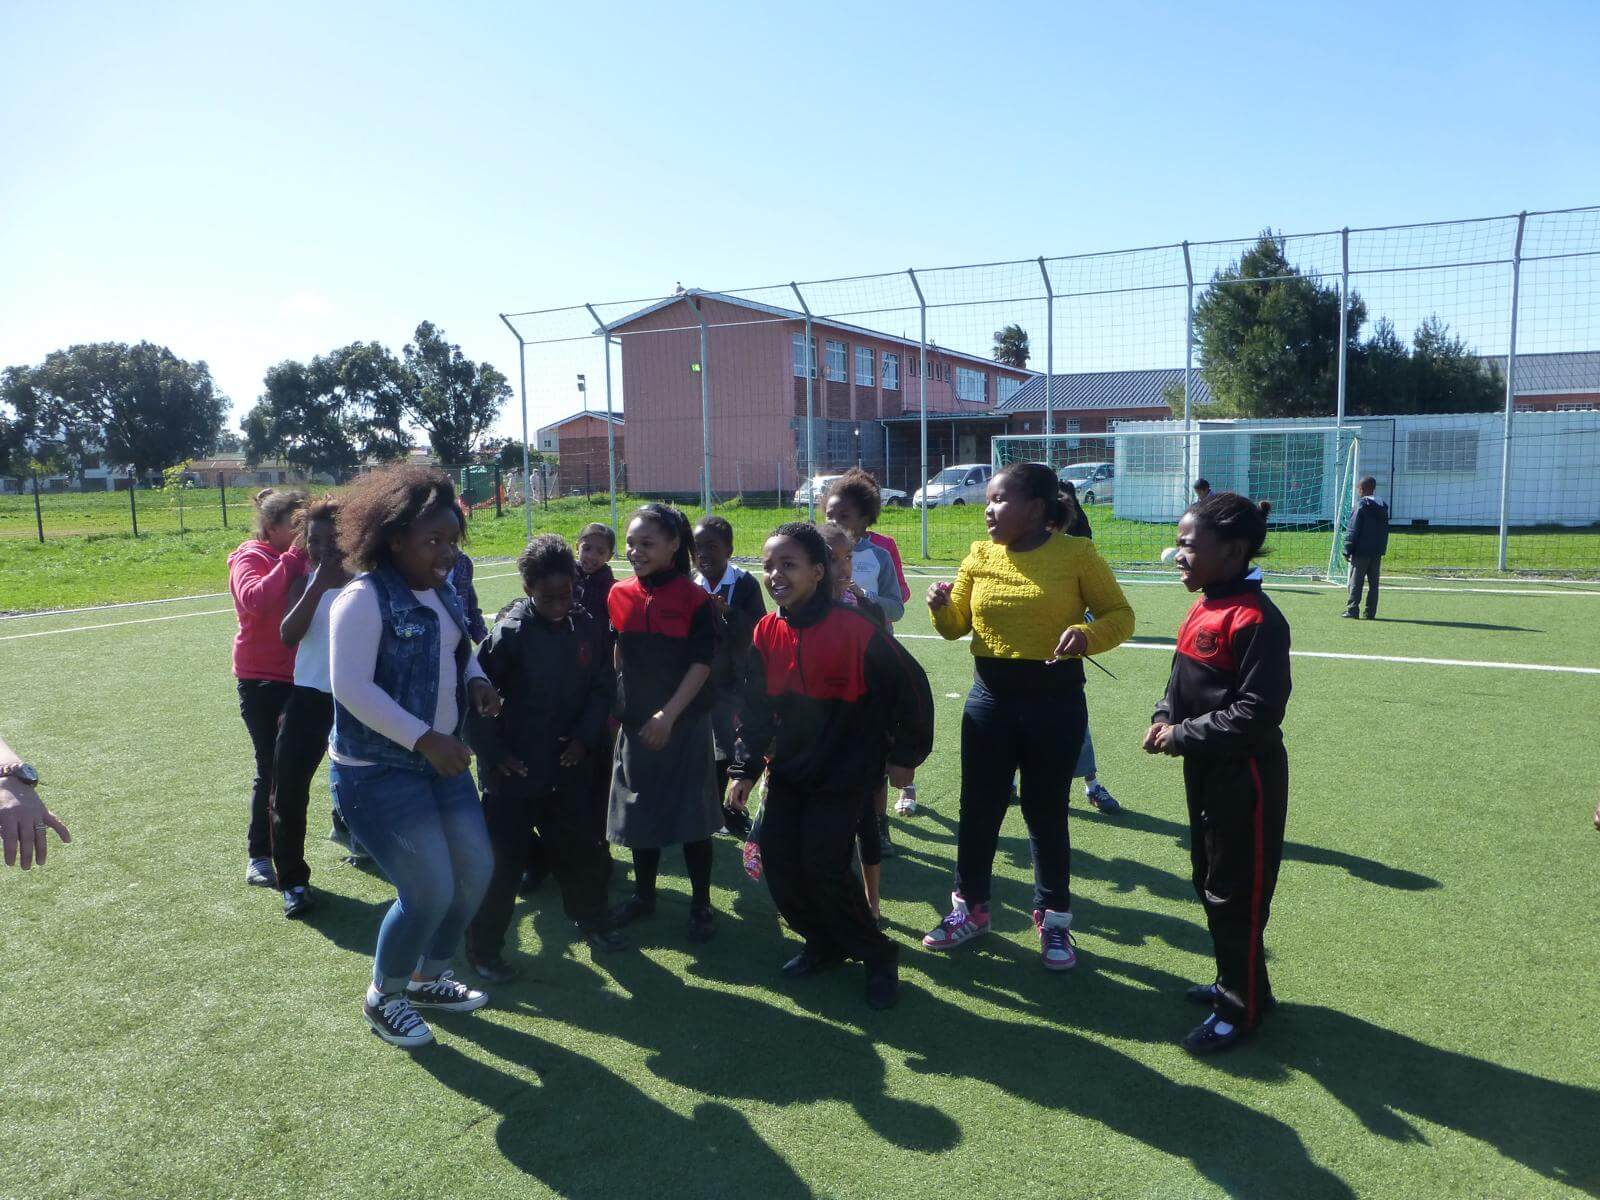 Lara beim Amazing Race Fußball-Projekt